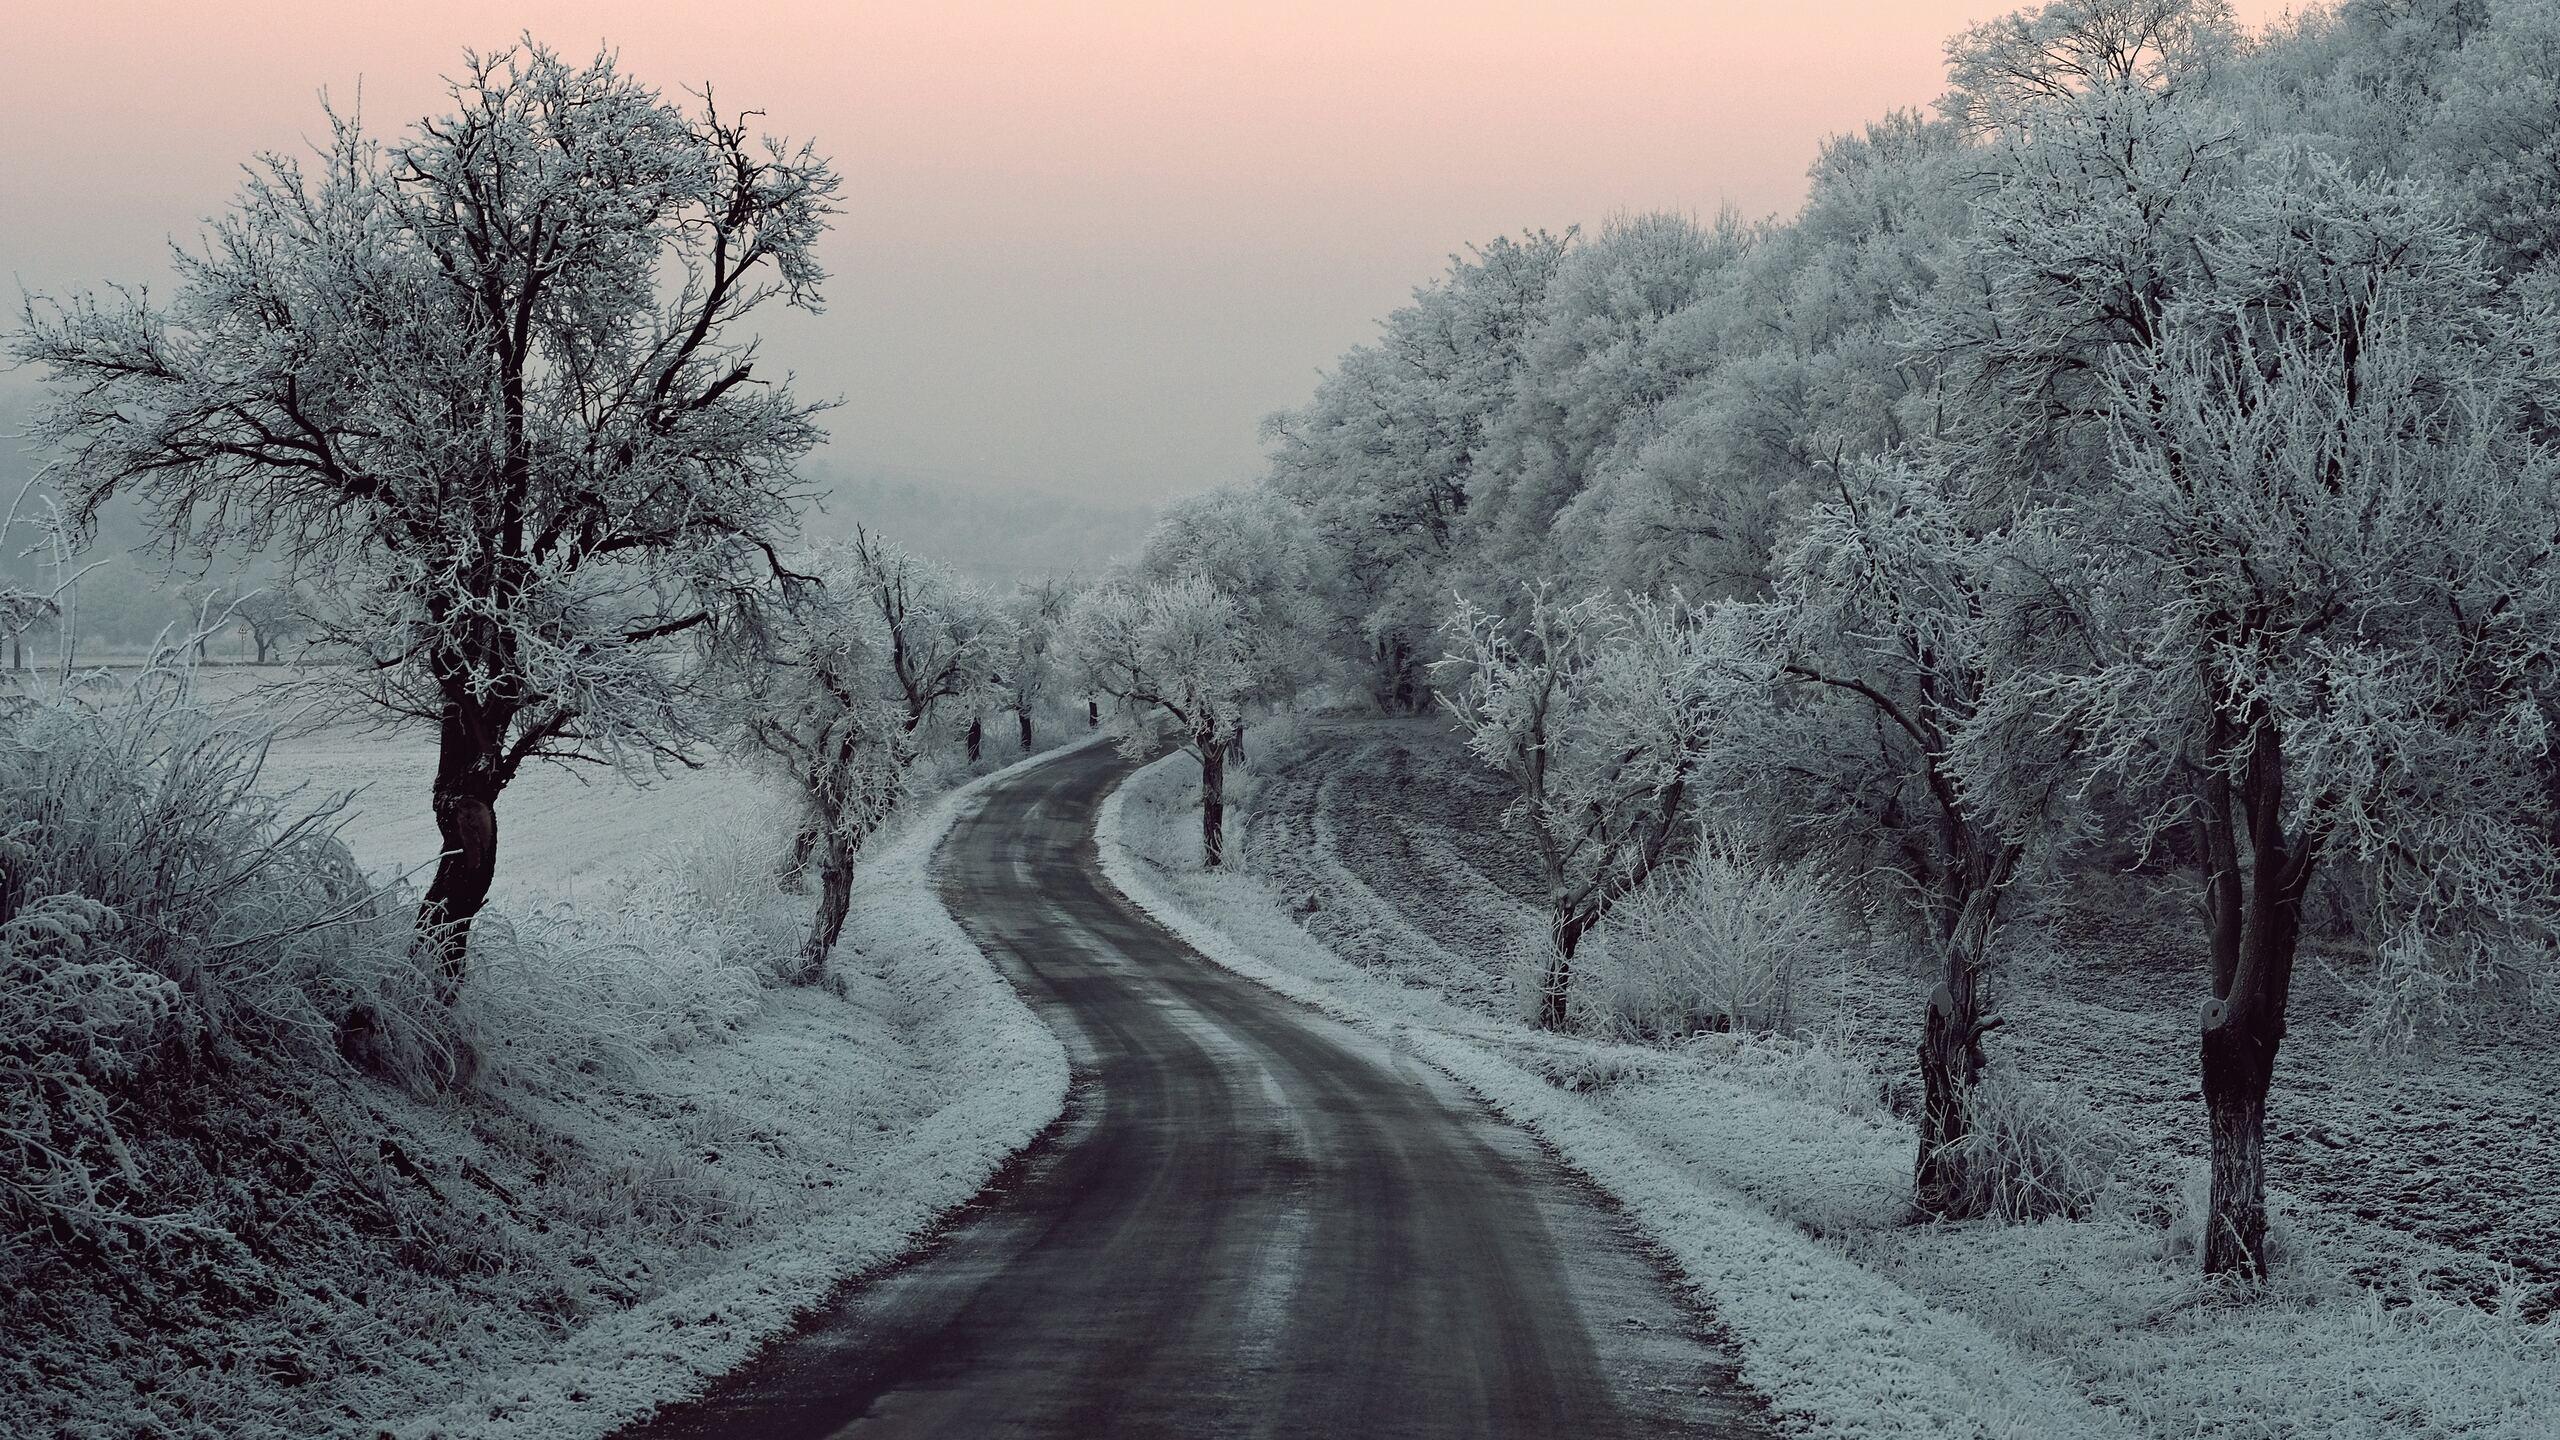 winter-road-snow-frozen-trees-on-sides-5k-27.jpg